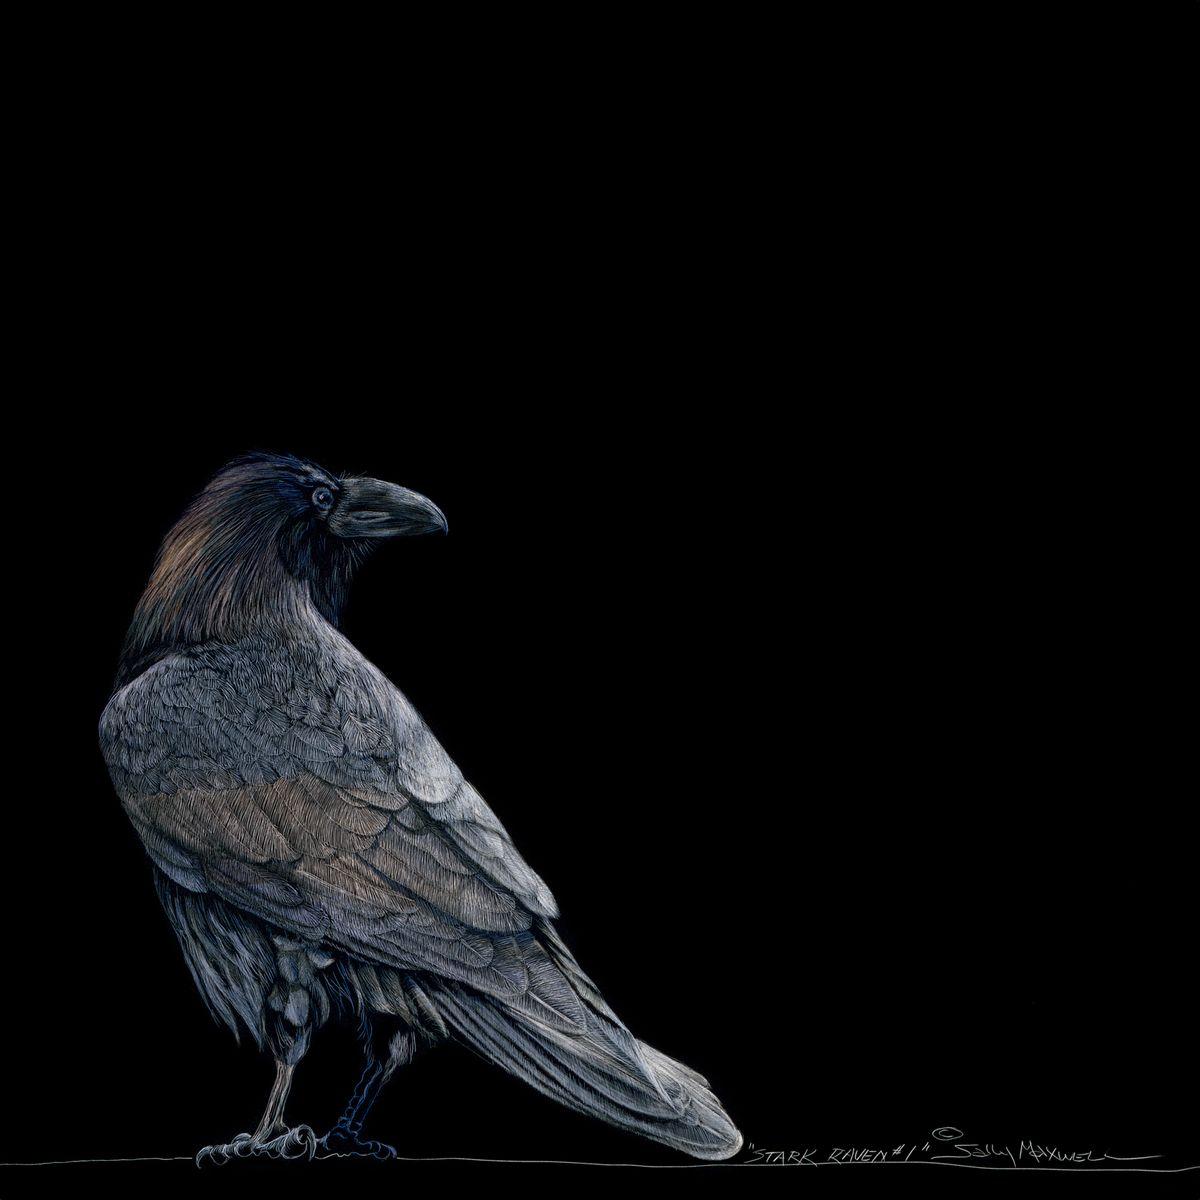 12x12 Stark Raven Black.jpg